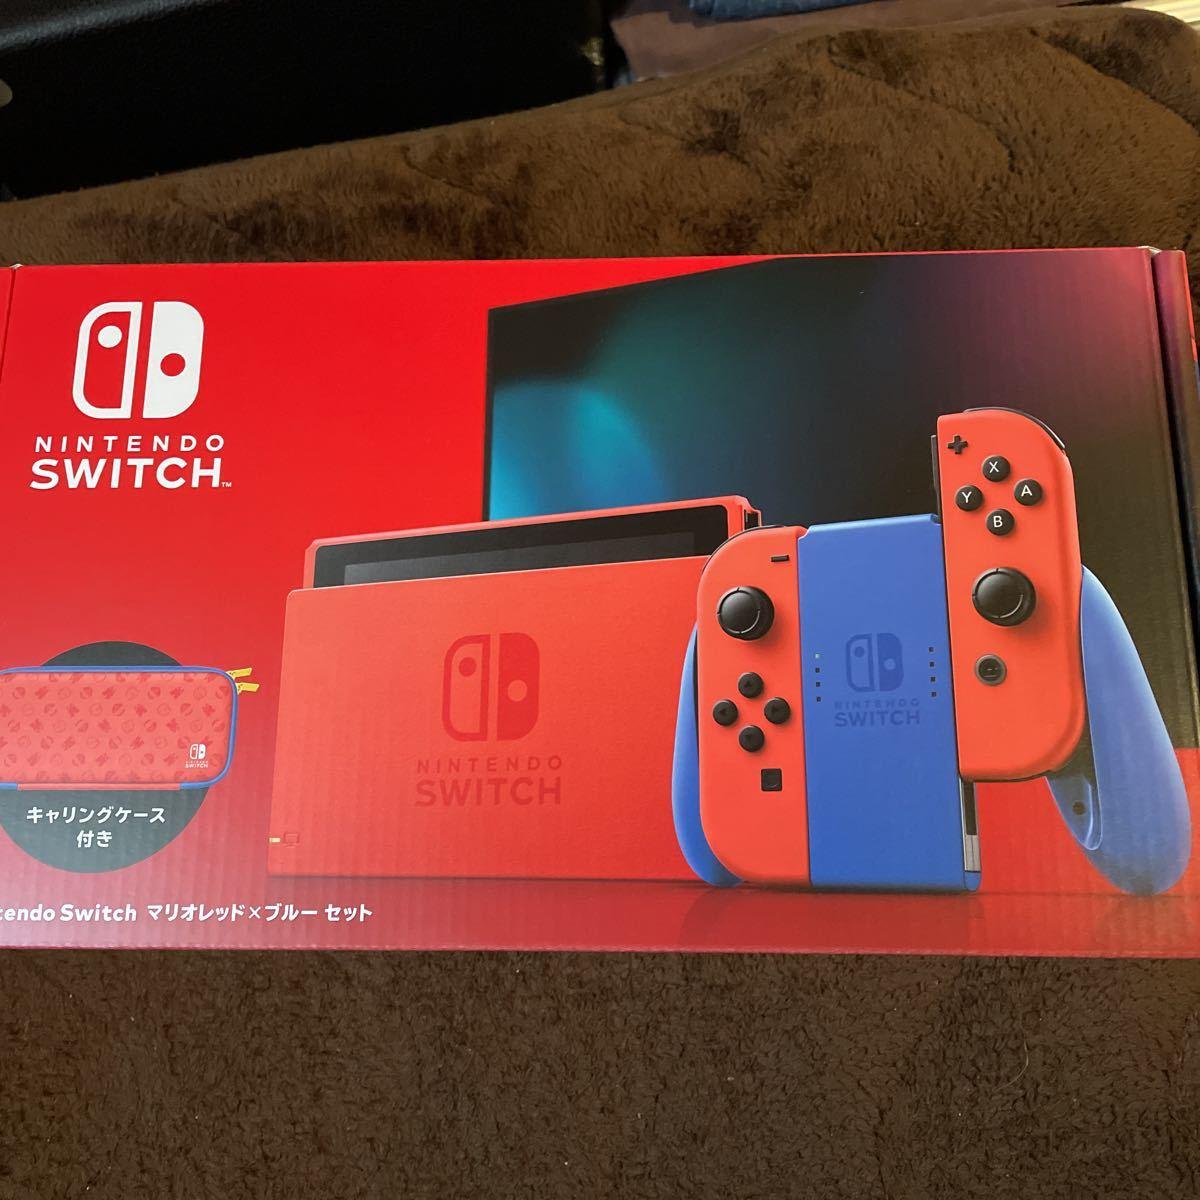 Nintendo Switch ニンテンドースイッチ本体 Nintendo 任天堂 マリオレッド